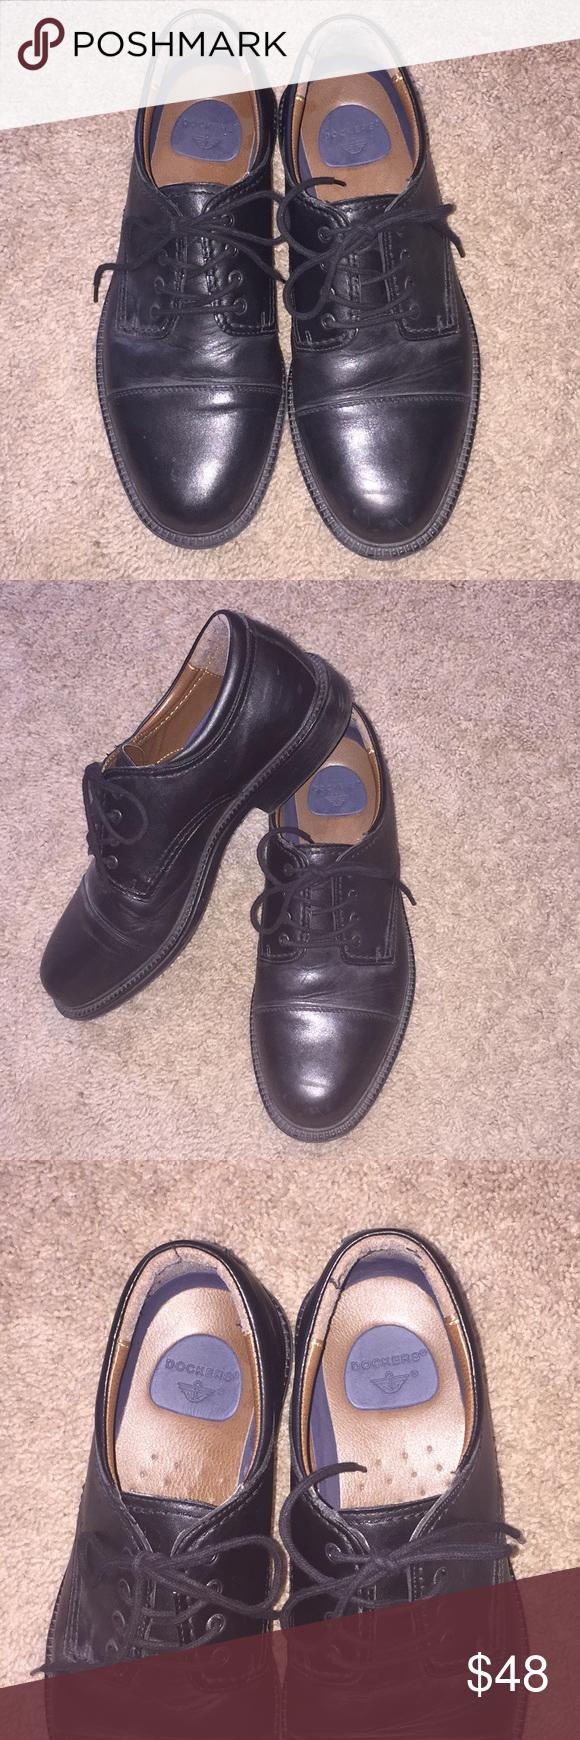 af3134500dc6 Dockers Leather Men s Shoes Black Lace Up Derby 10 Dockers Leather Men s  Shoes Black Lace Up Sz 10M Good condition Smokefree Dockers Shoes Oxfords    Derbys